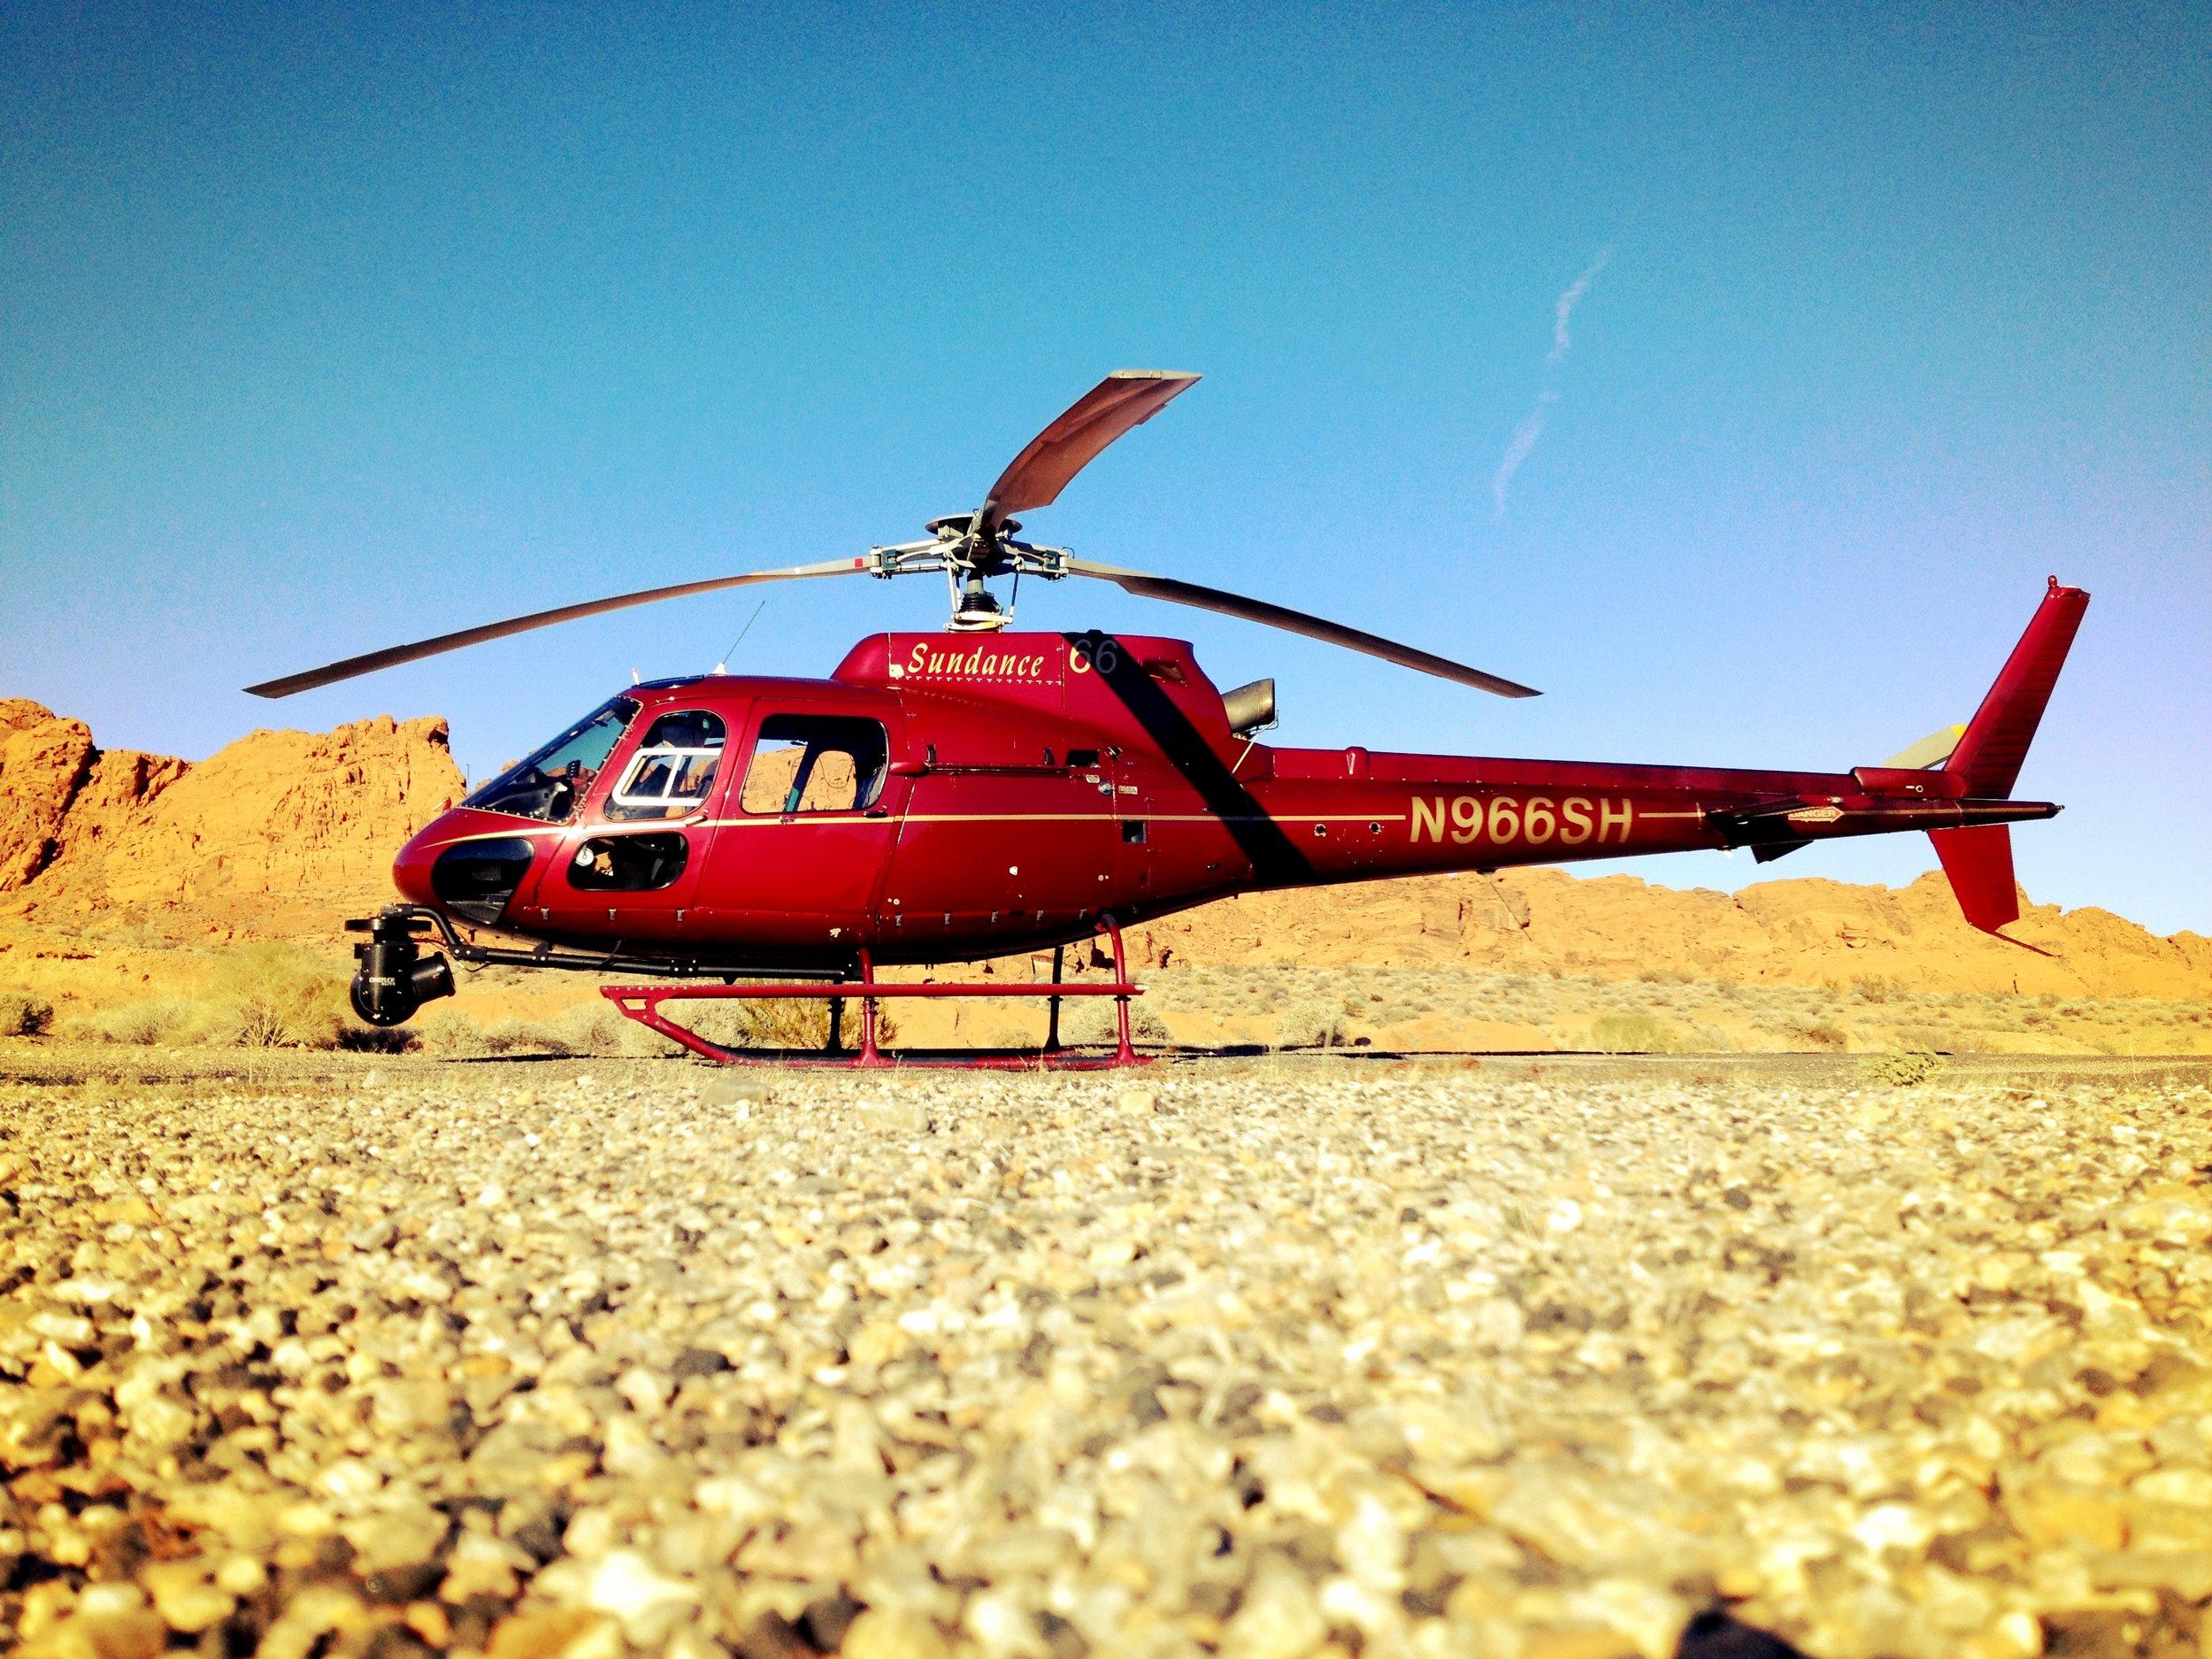 2016_04_Cineflex_Elite on Sundance Helicopter.JPG